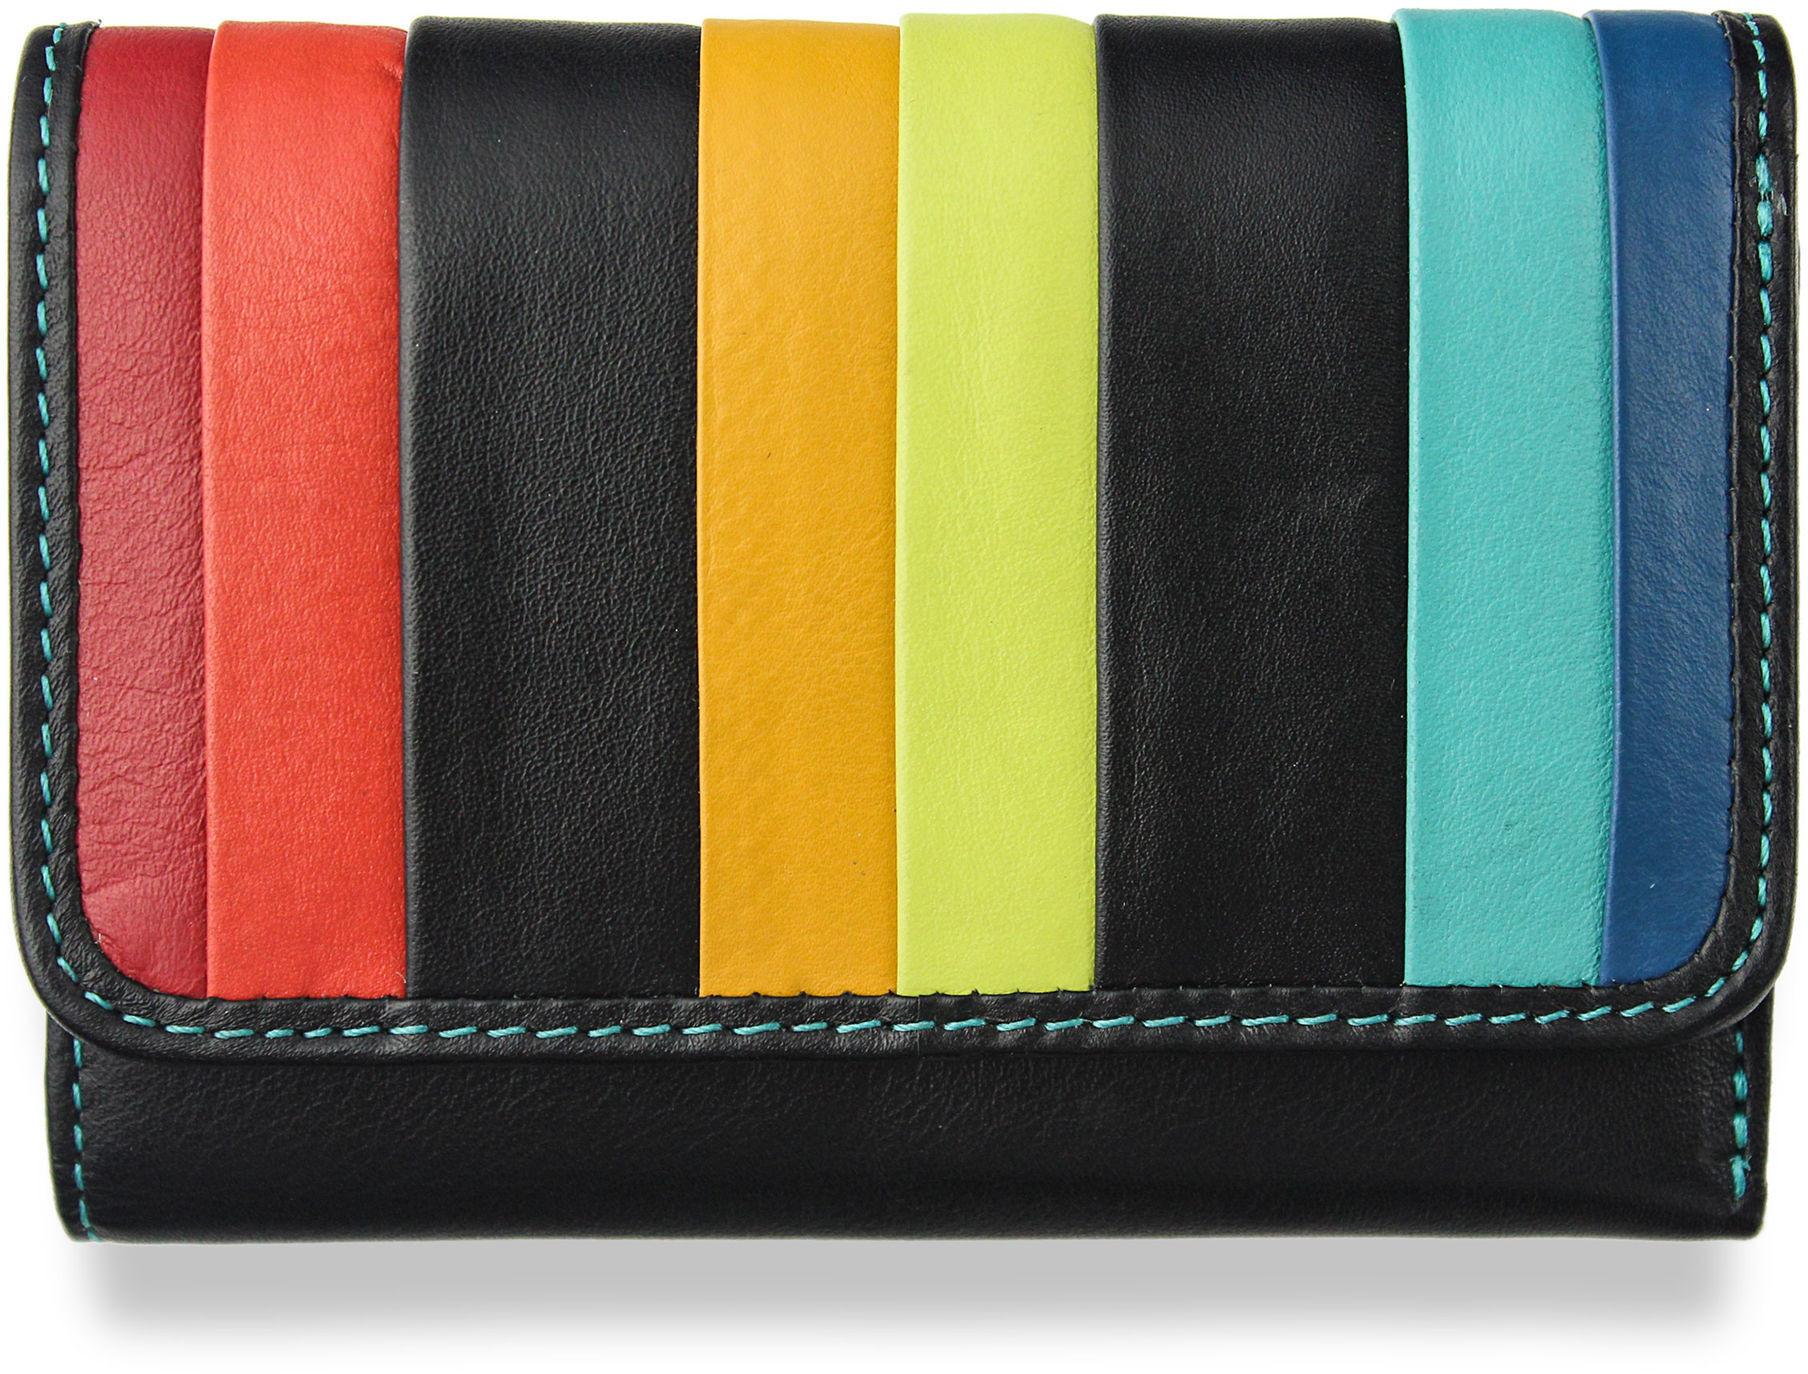 dafc2449ad013 Visconti Portfel Damski Skórzany Santorini RFID STR-3 Black Multi